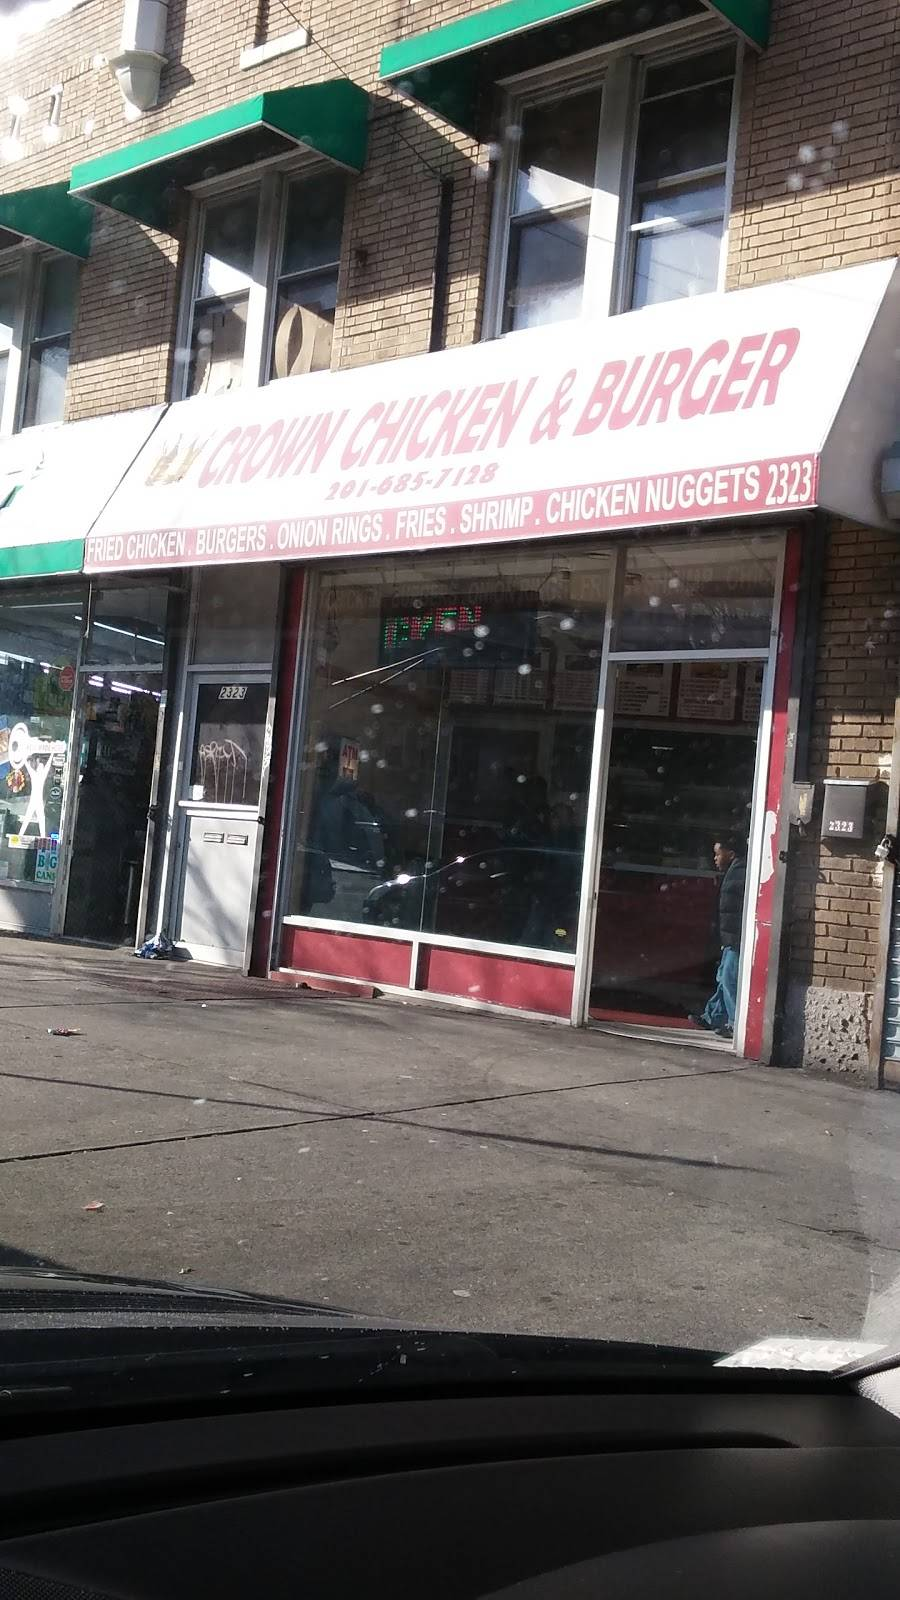 Crown Chicken & Burger | restaurant | 2323 John F. Kennedy Blvd, Jersey City, NJ 07304, USA | 2016857128 OR +1 201-685-7128